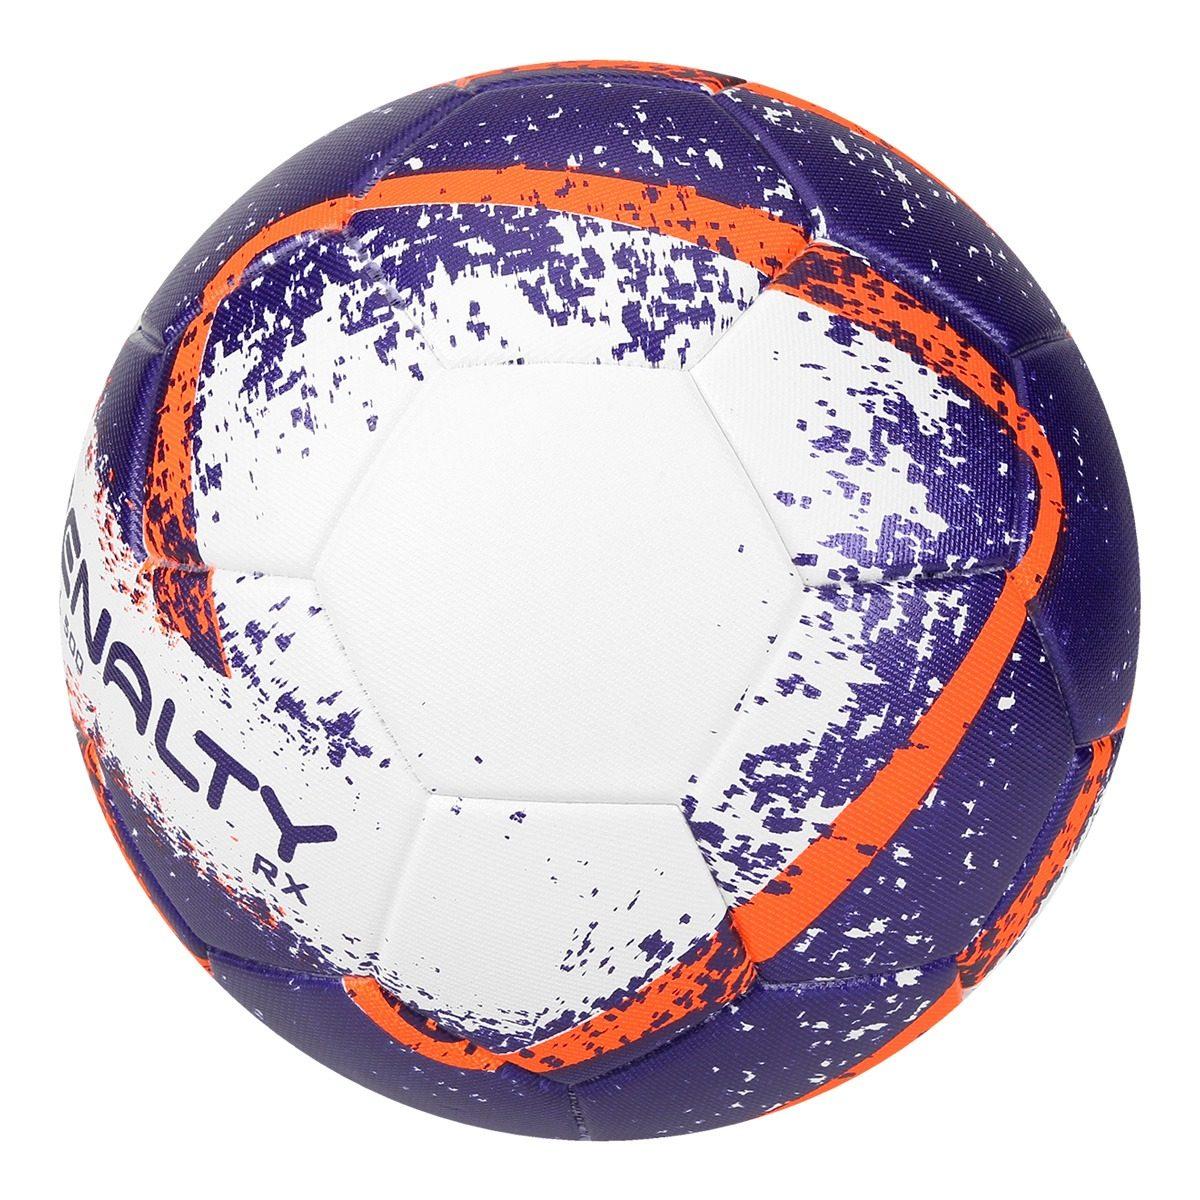 f08fc2c74 bola futsal penalty rx 500 r2 fusion viii - branco e laranja. Carregando  zoom.